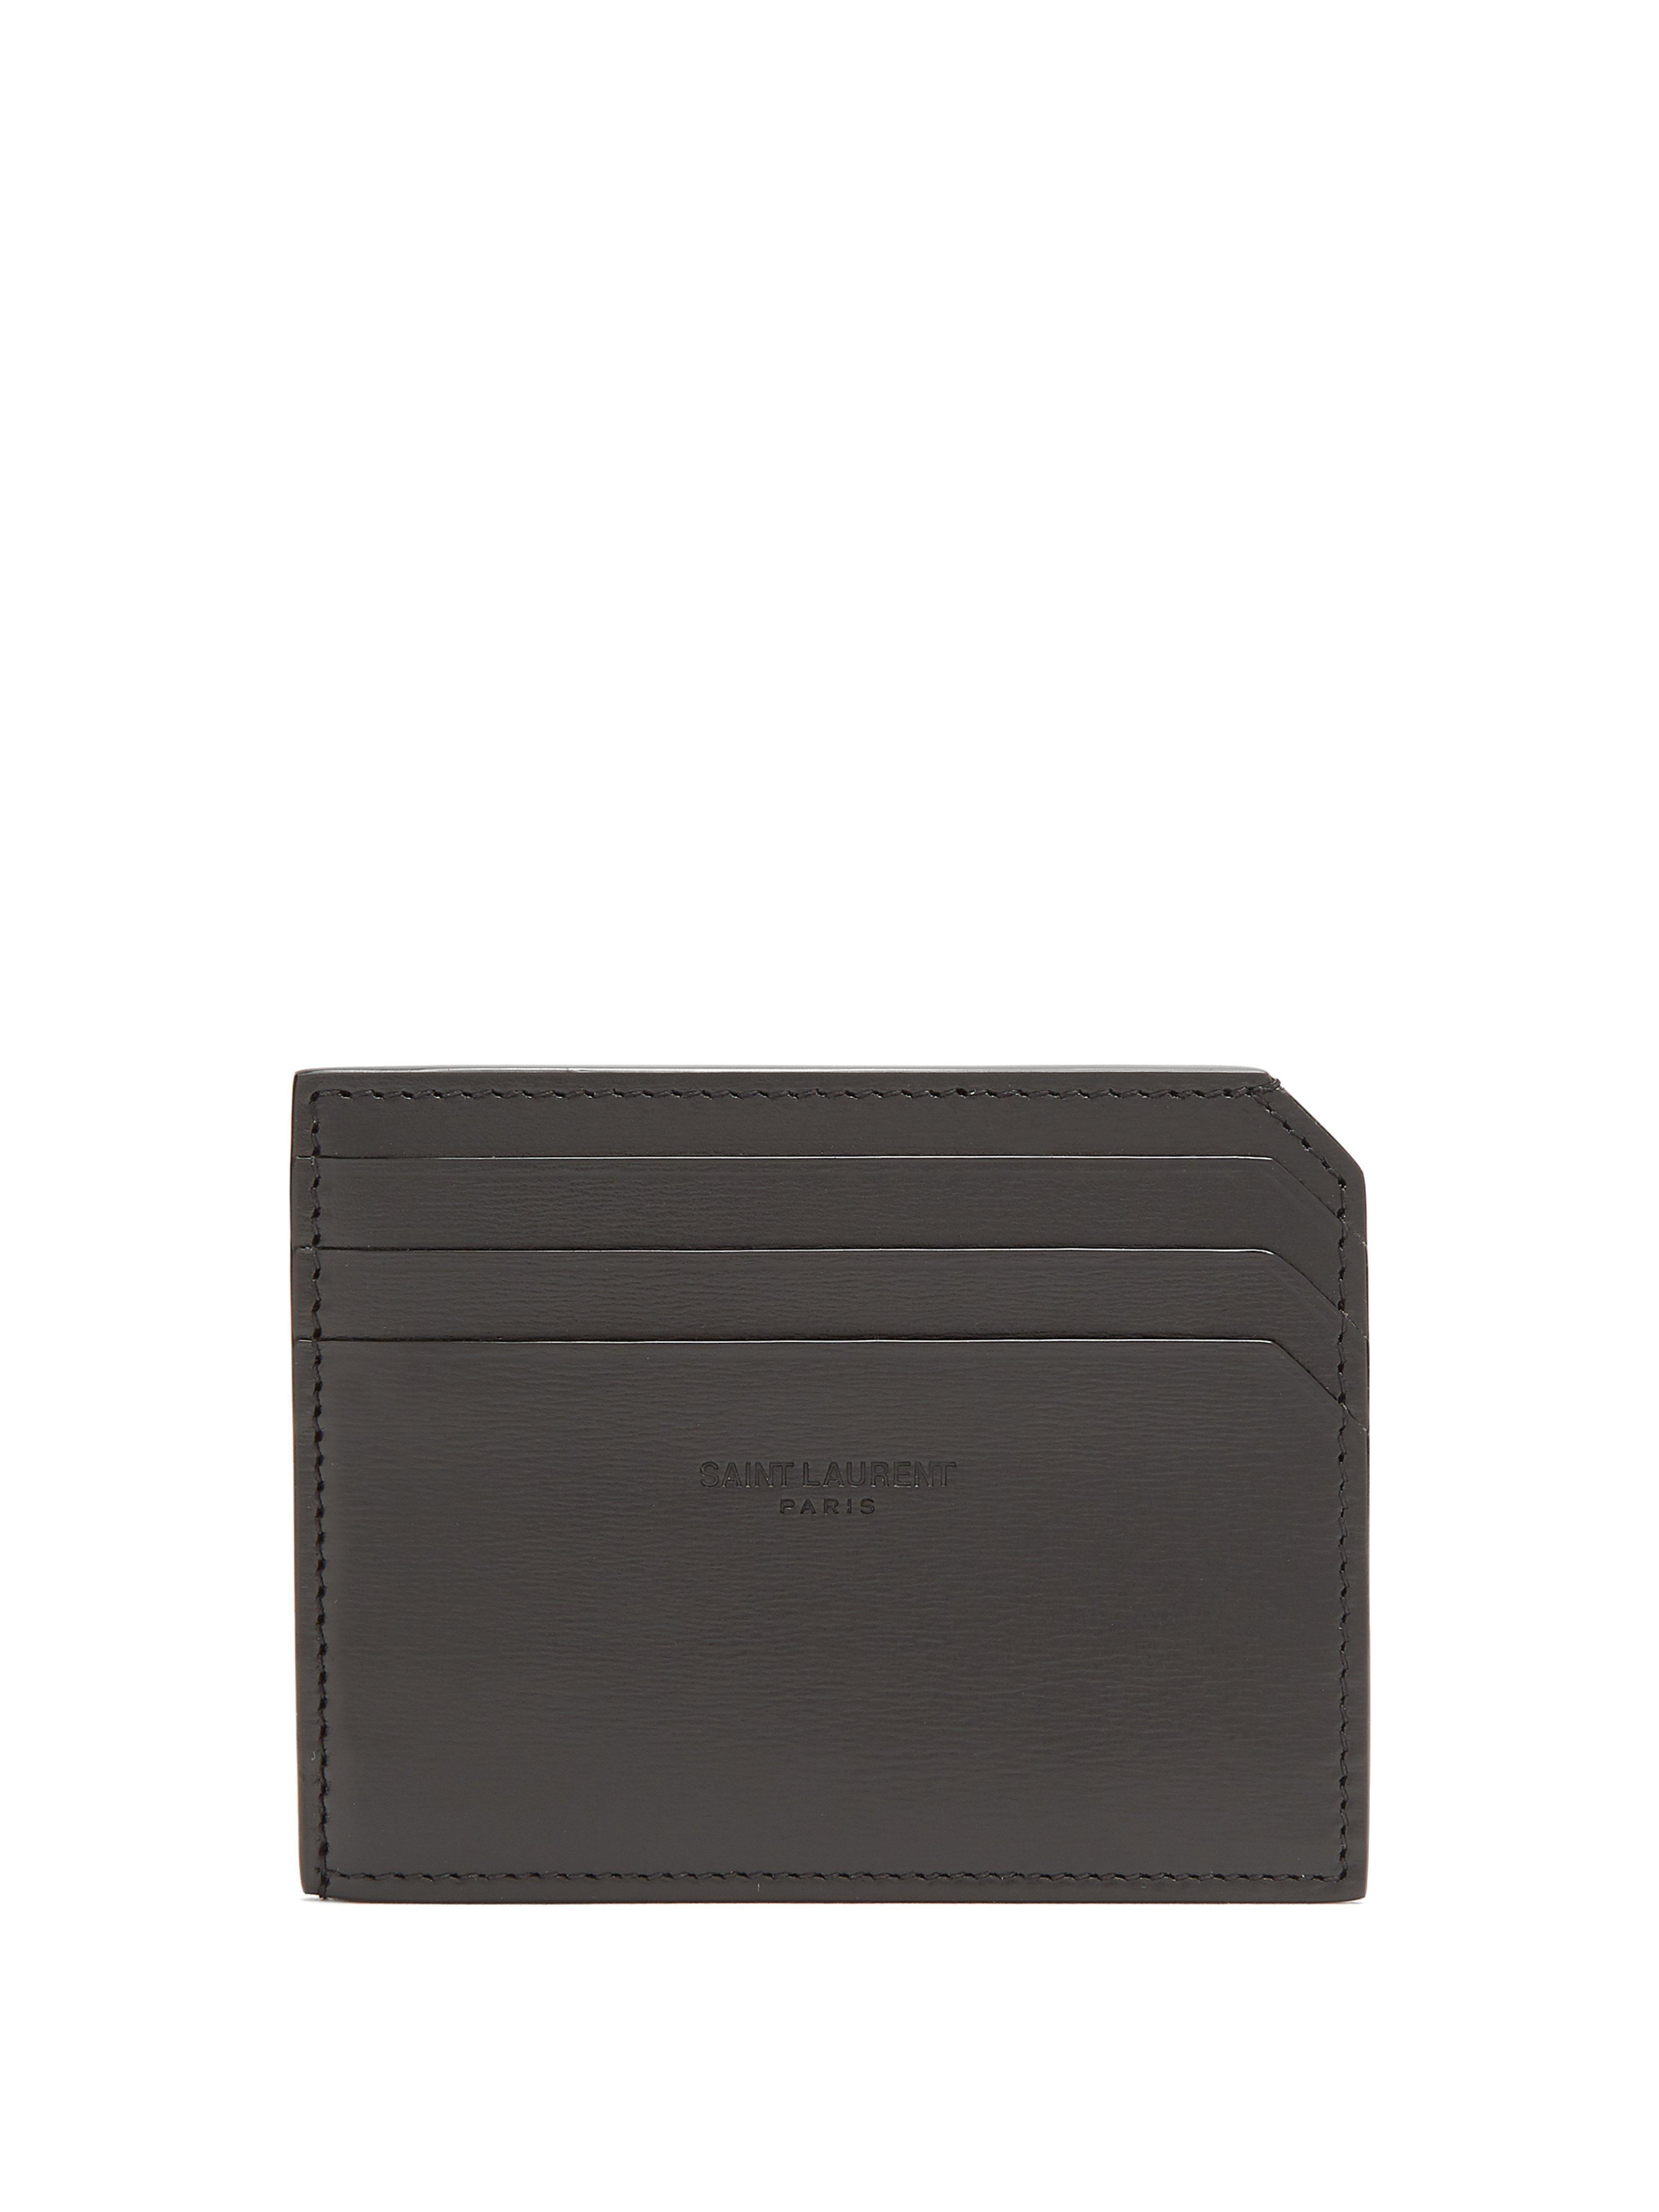 cd846dd2309 Saint Laurent Fragments Leather Cardholder in Black for Men - Lyst